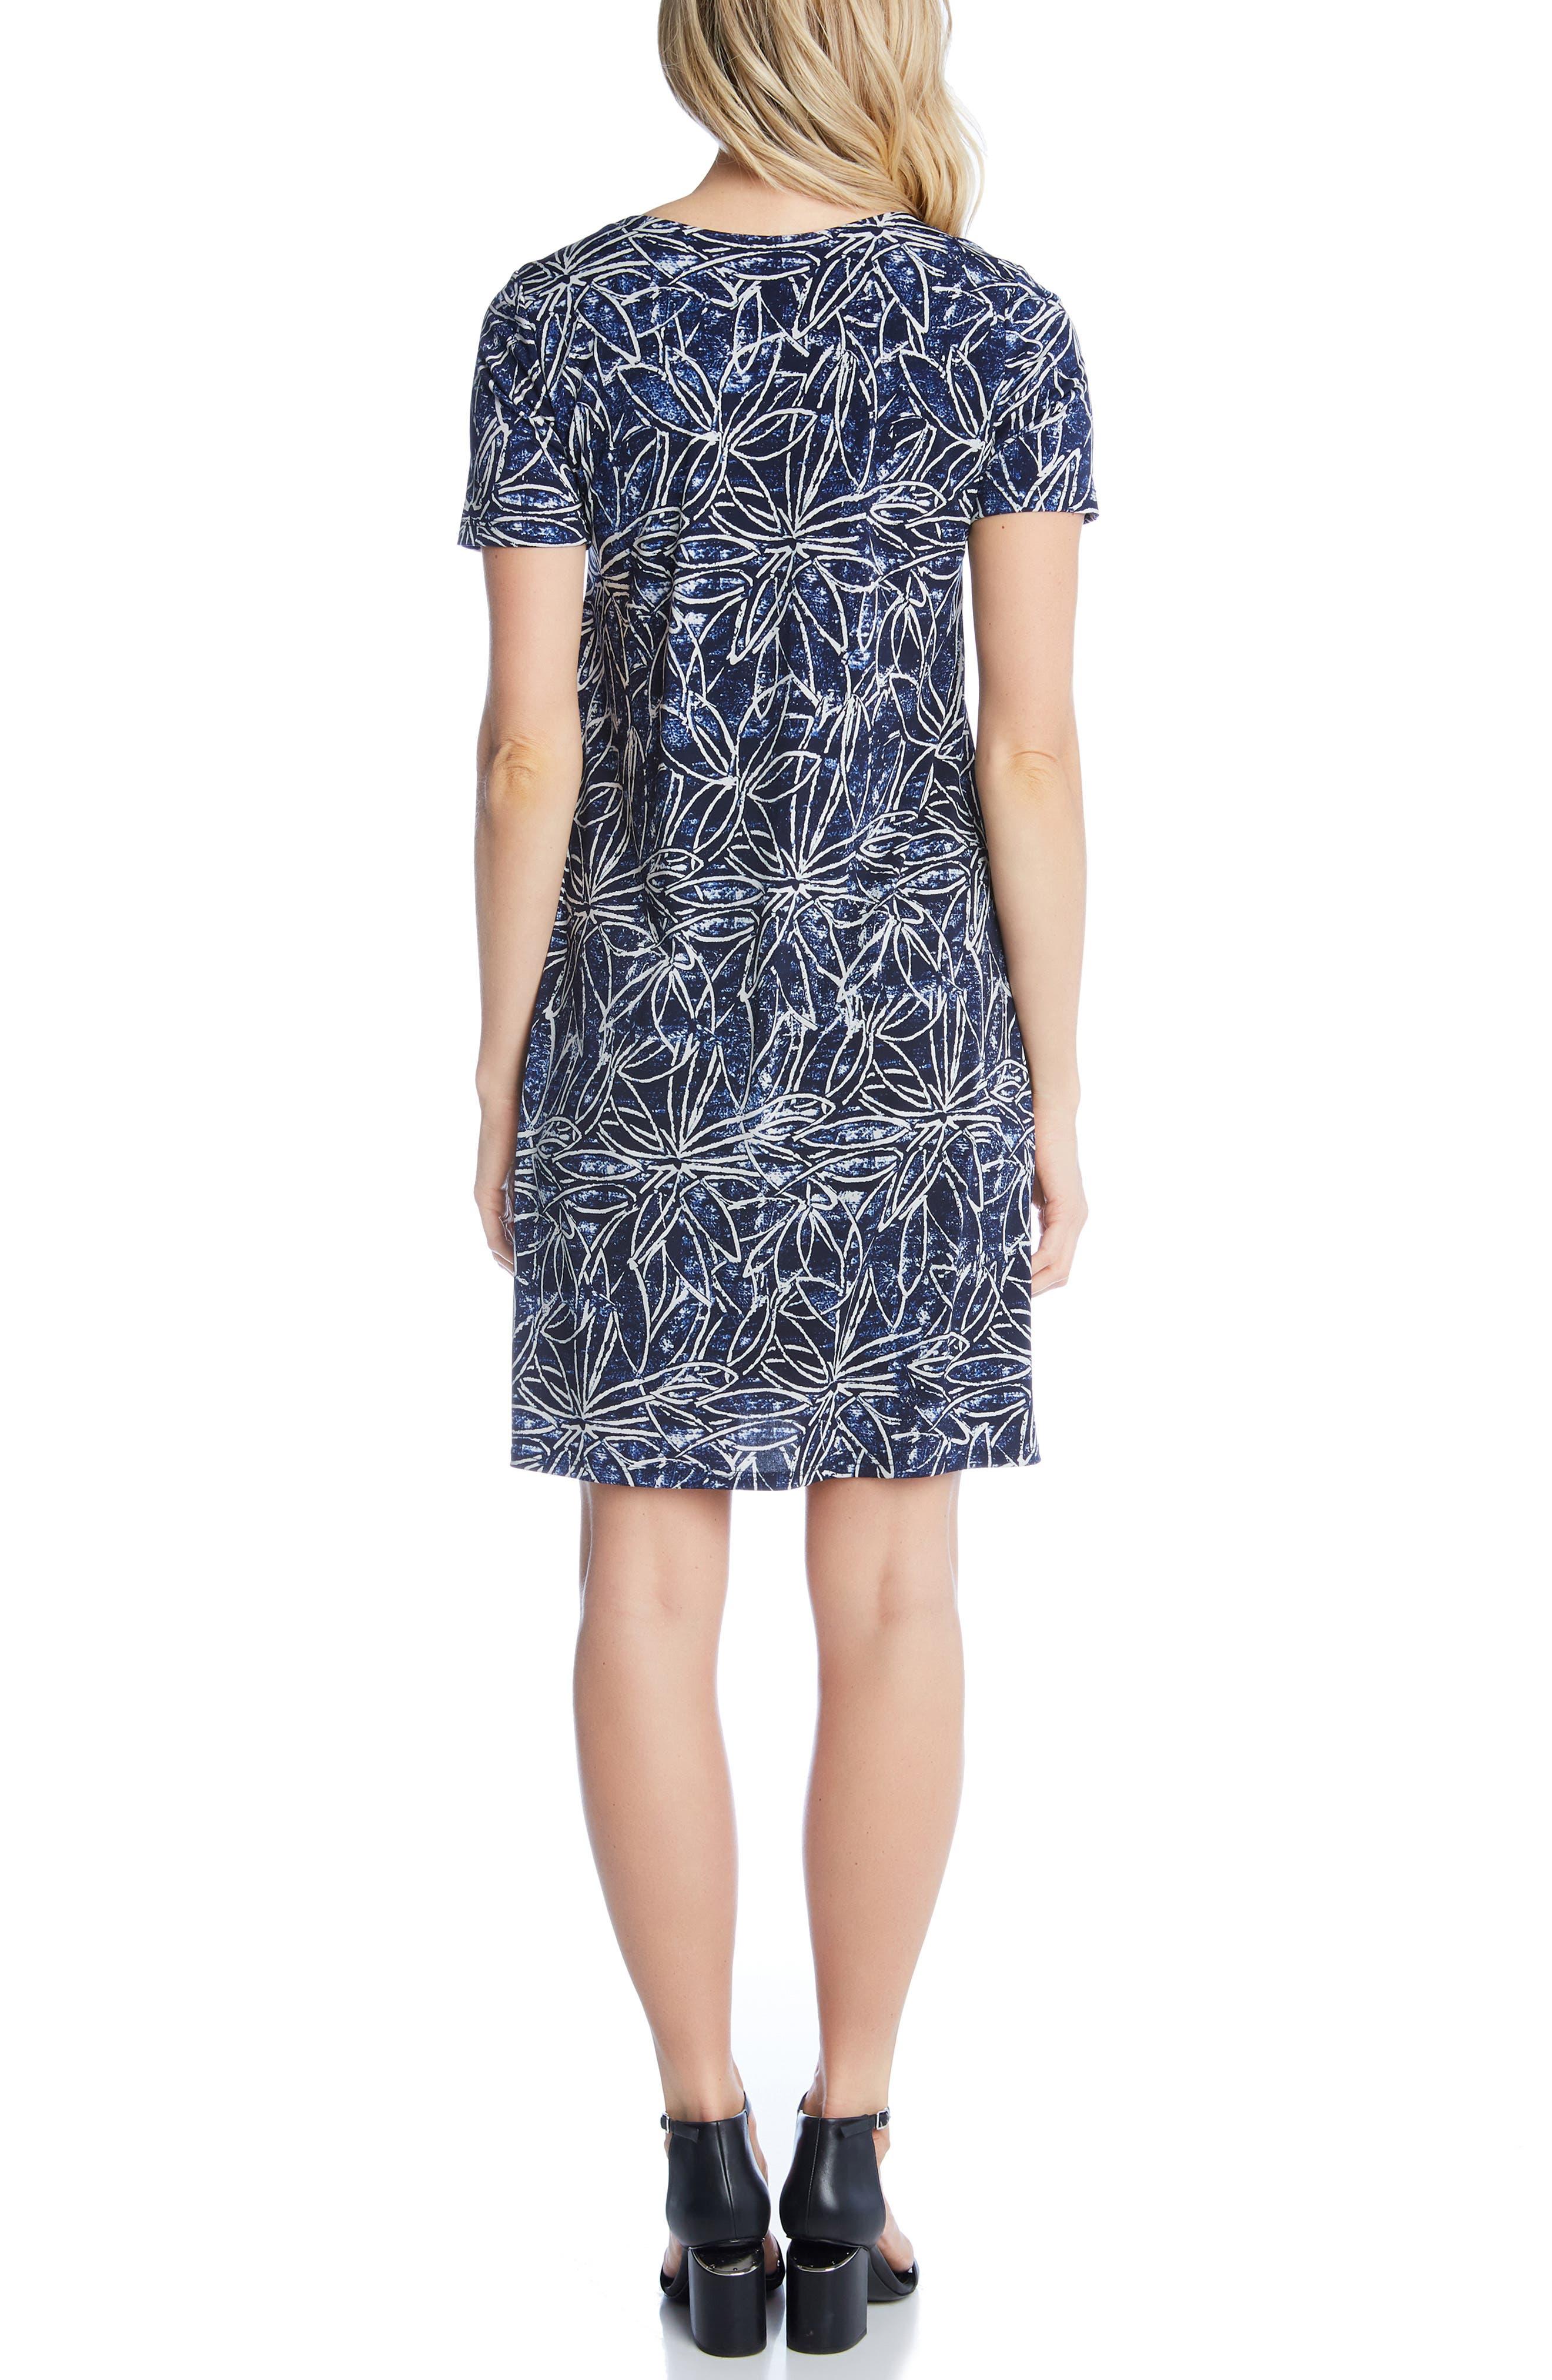 KAREN KANE, Floral Print Shift Dress, Alternate thumbnail 2, color, PRINT